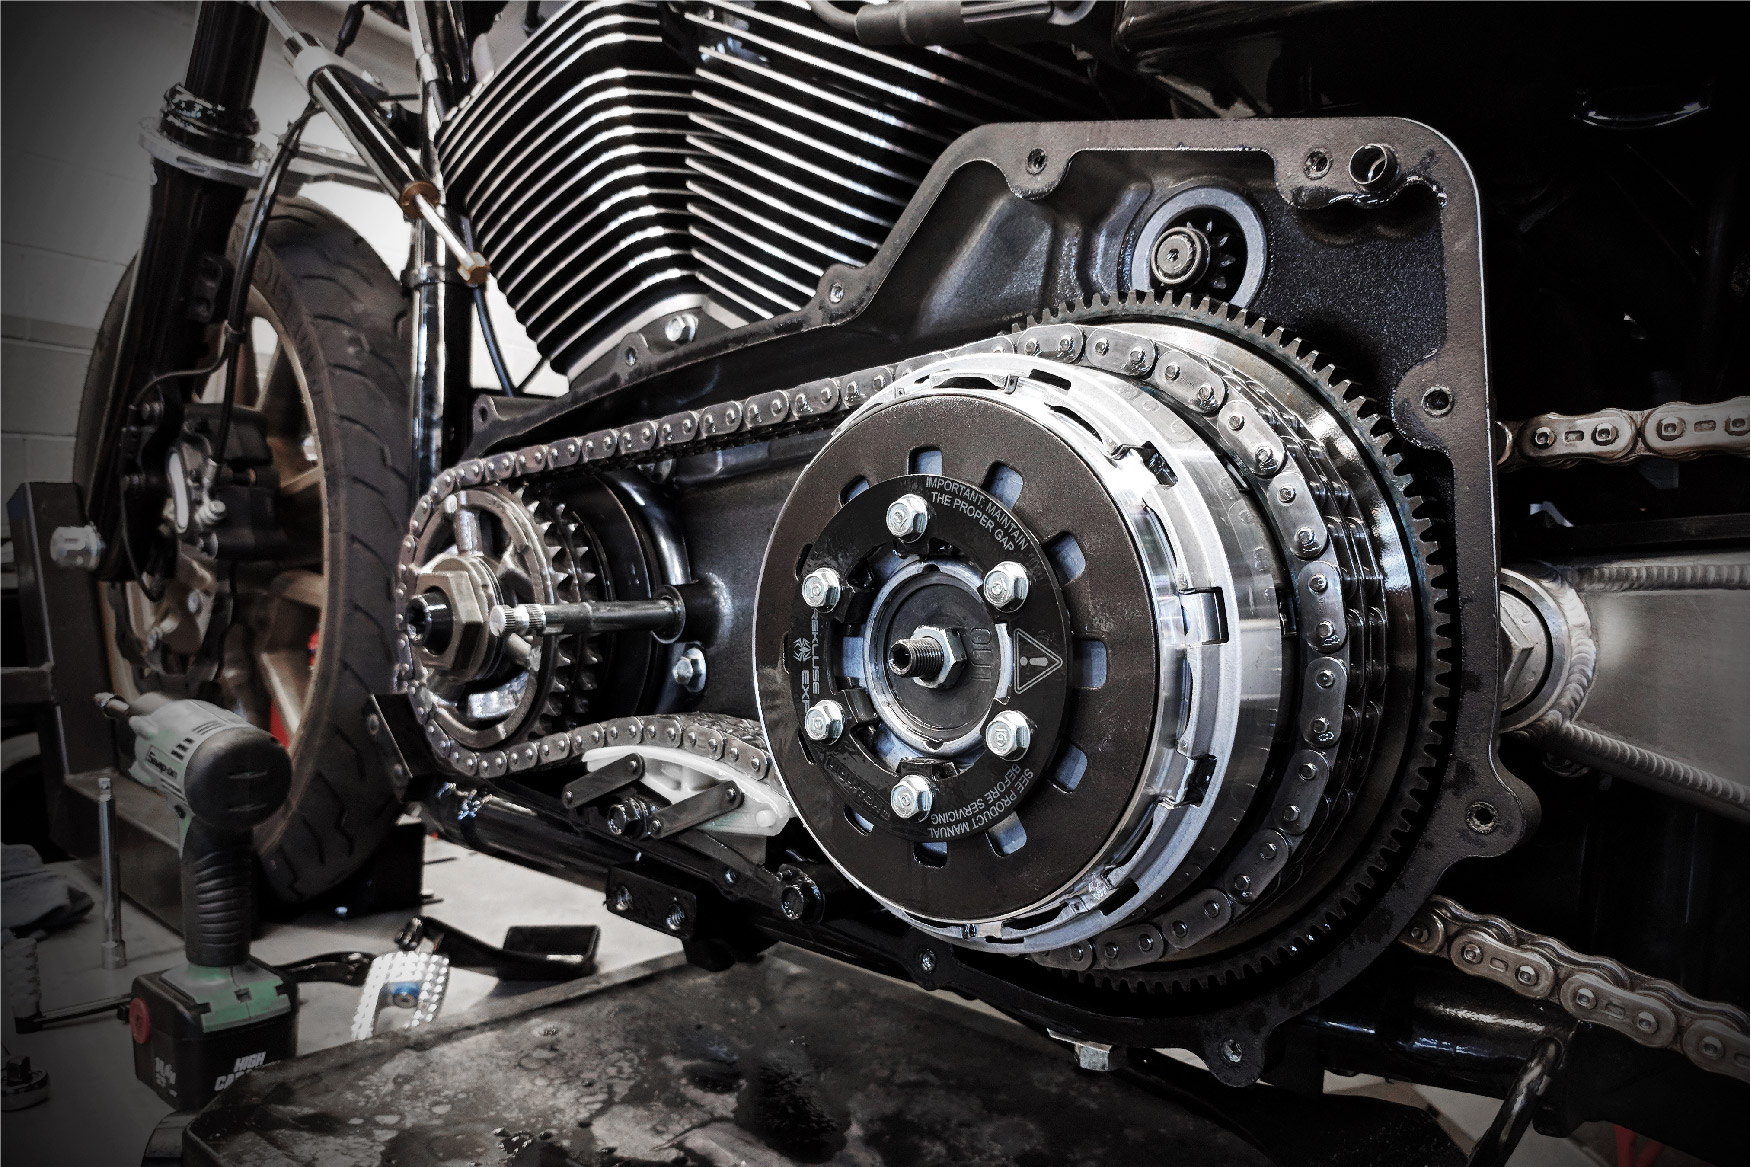 Rekluse Road Show at Daytona Bike Week 2020 - Factory Installations